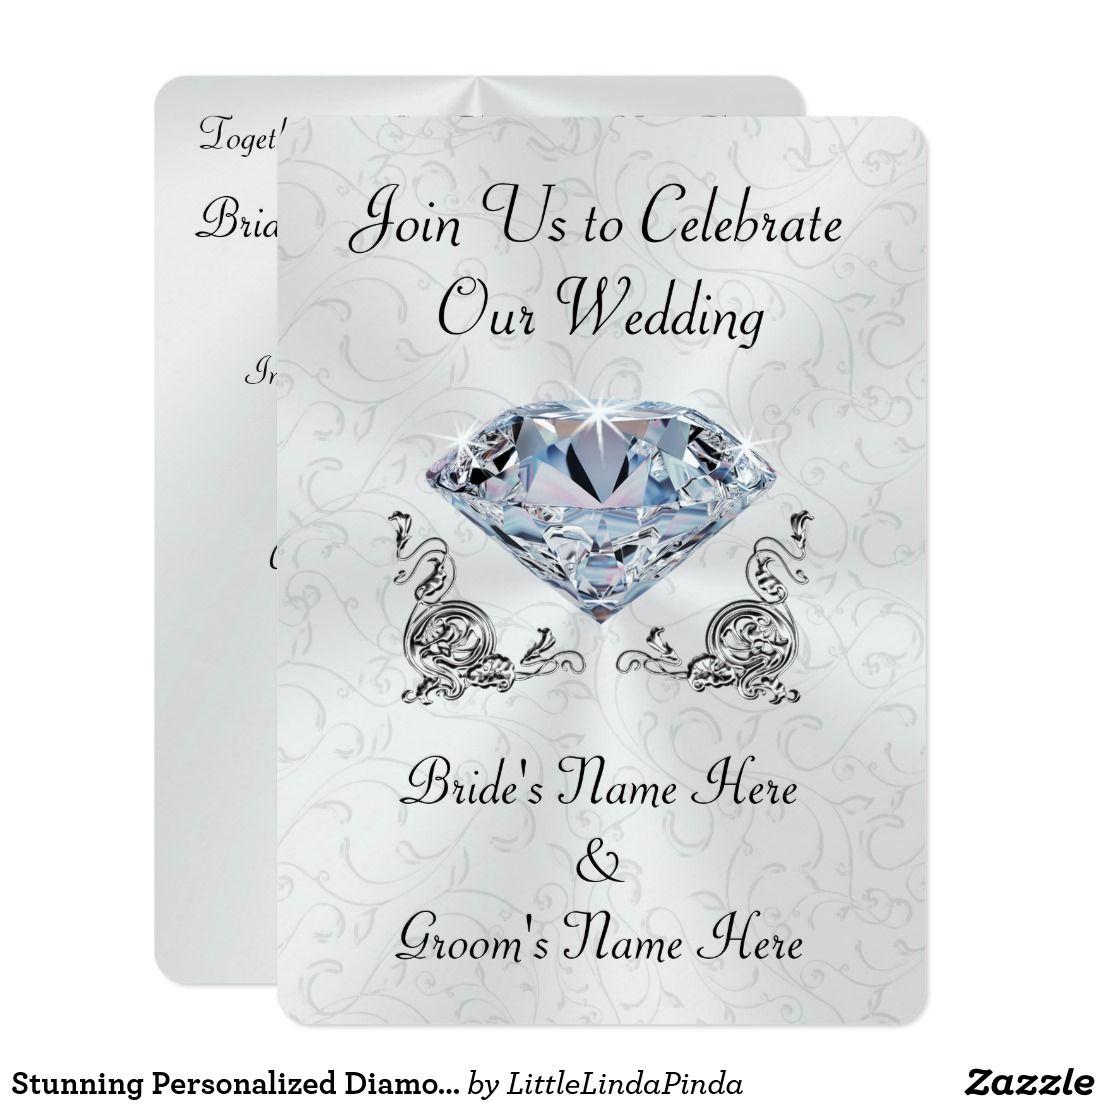 Stunning Personalized Diamond Wedding Invitations | Diamond and Weddings